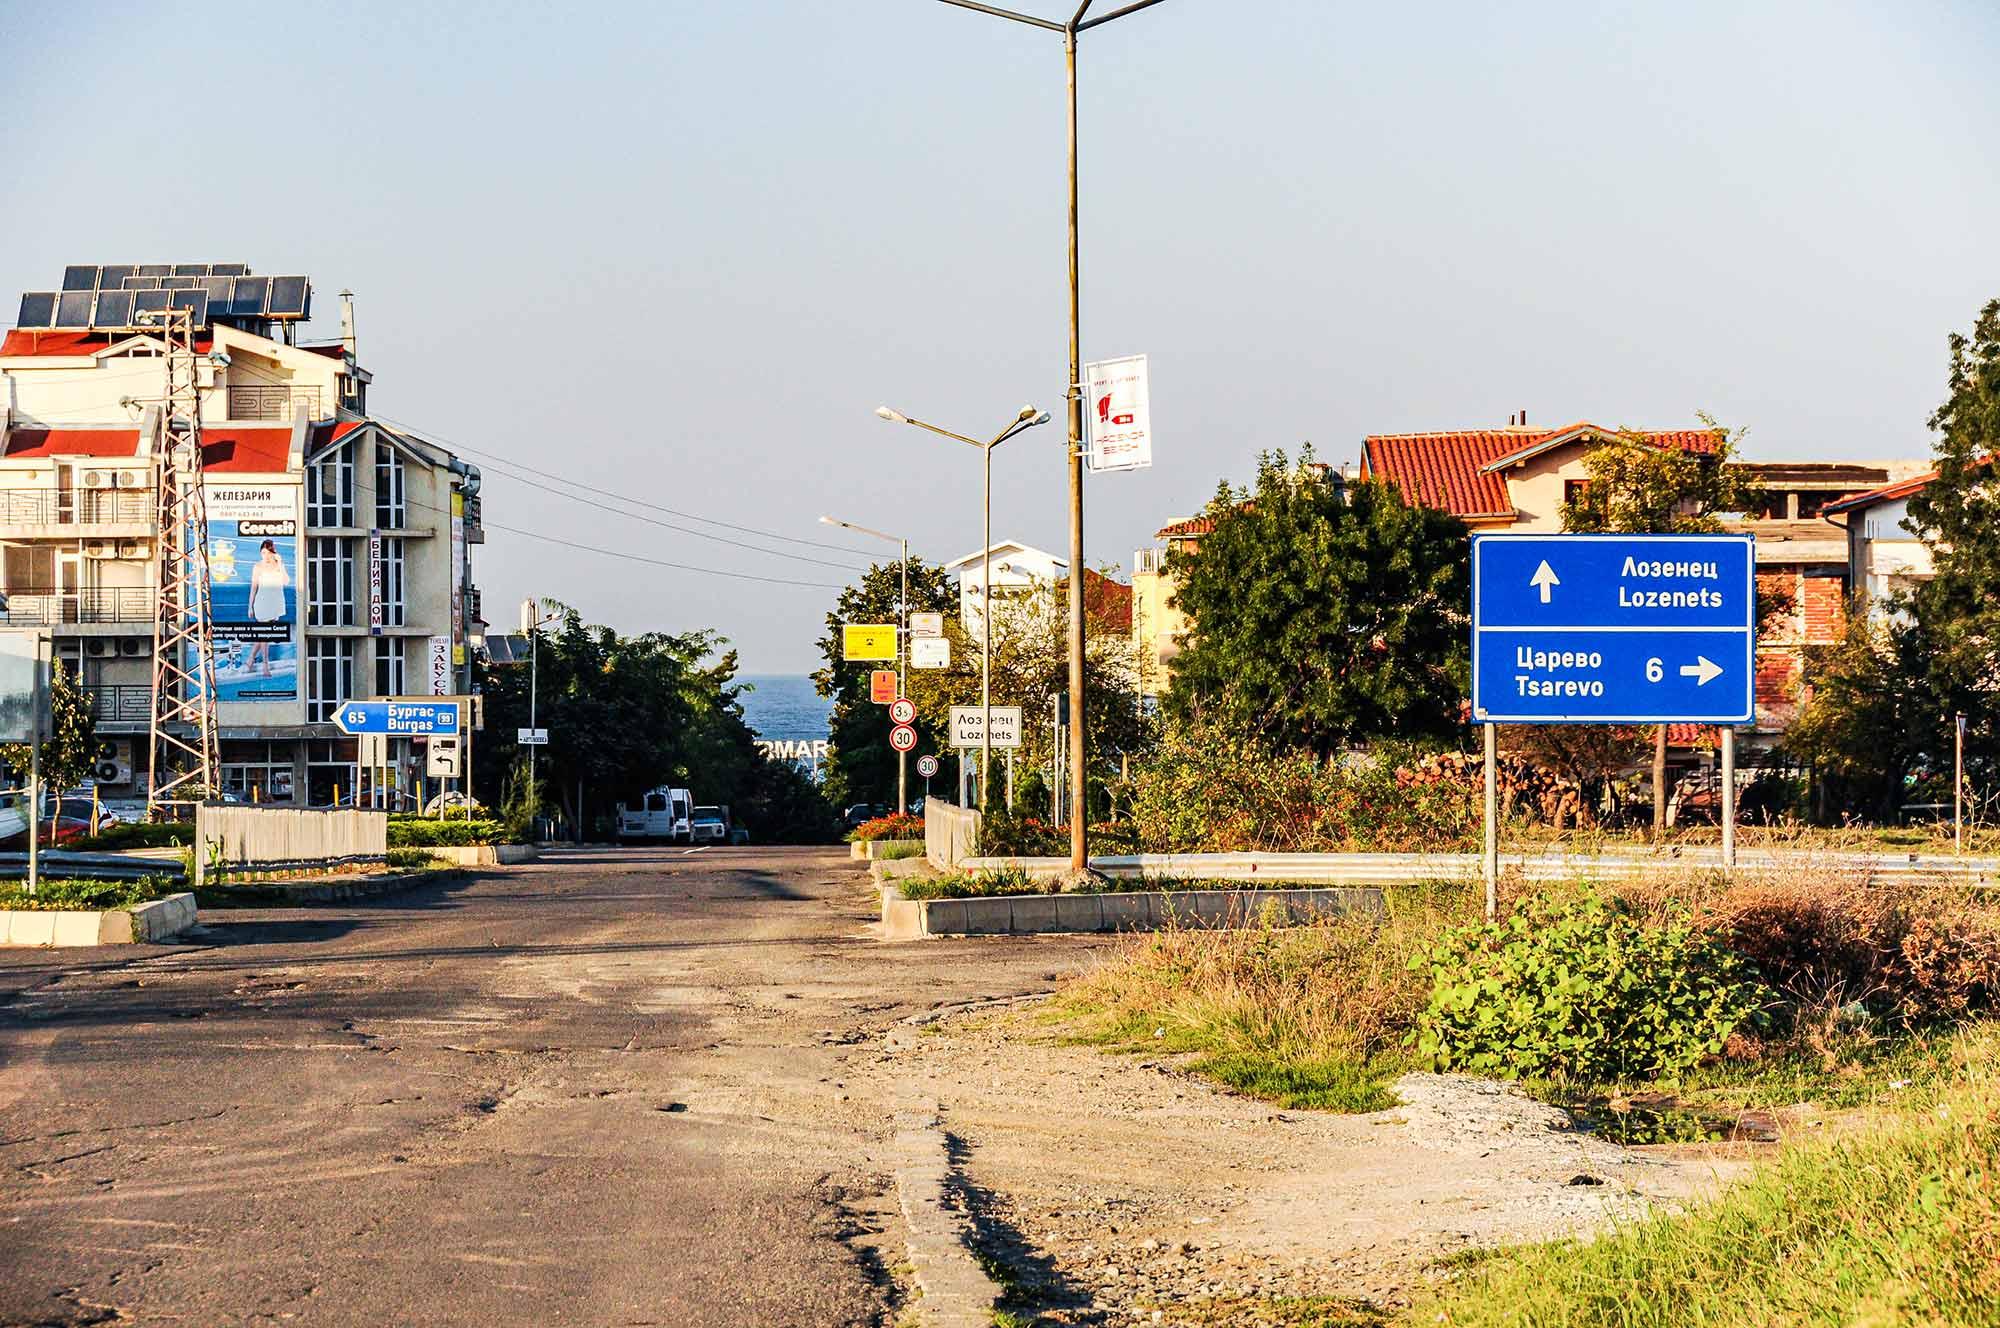 Im Bild: Lozenets am Schwarzen Meer in Bulgarien